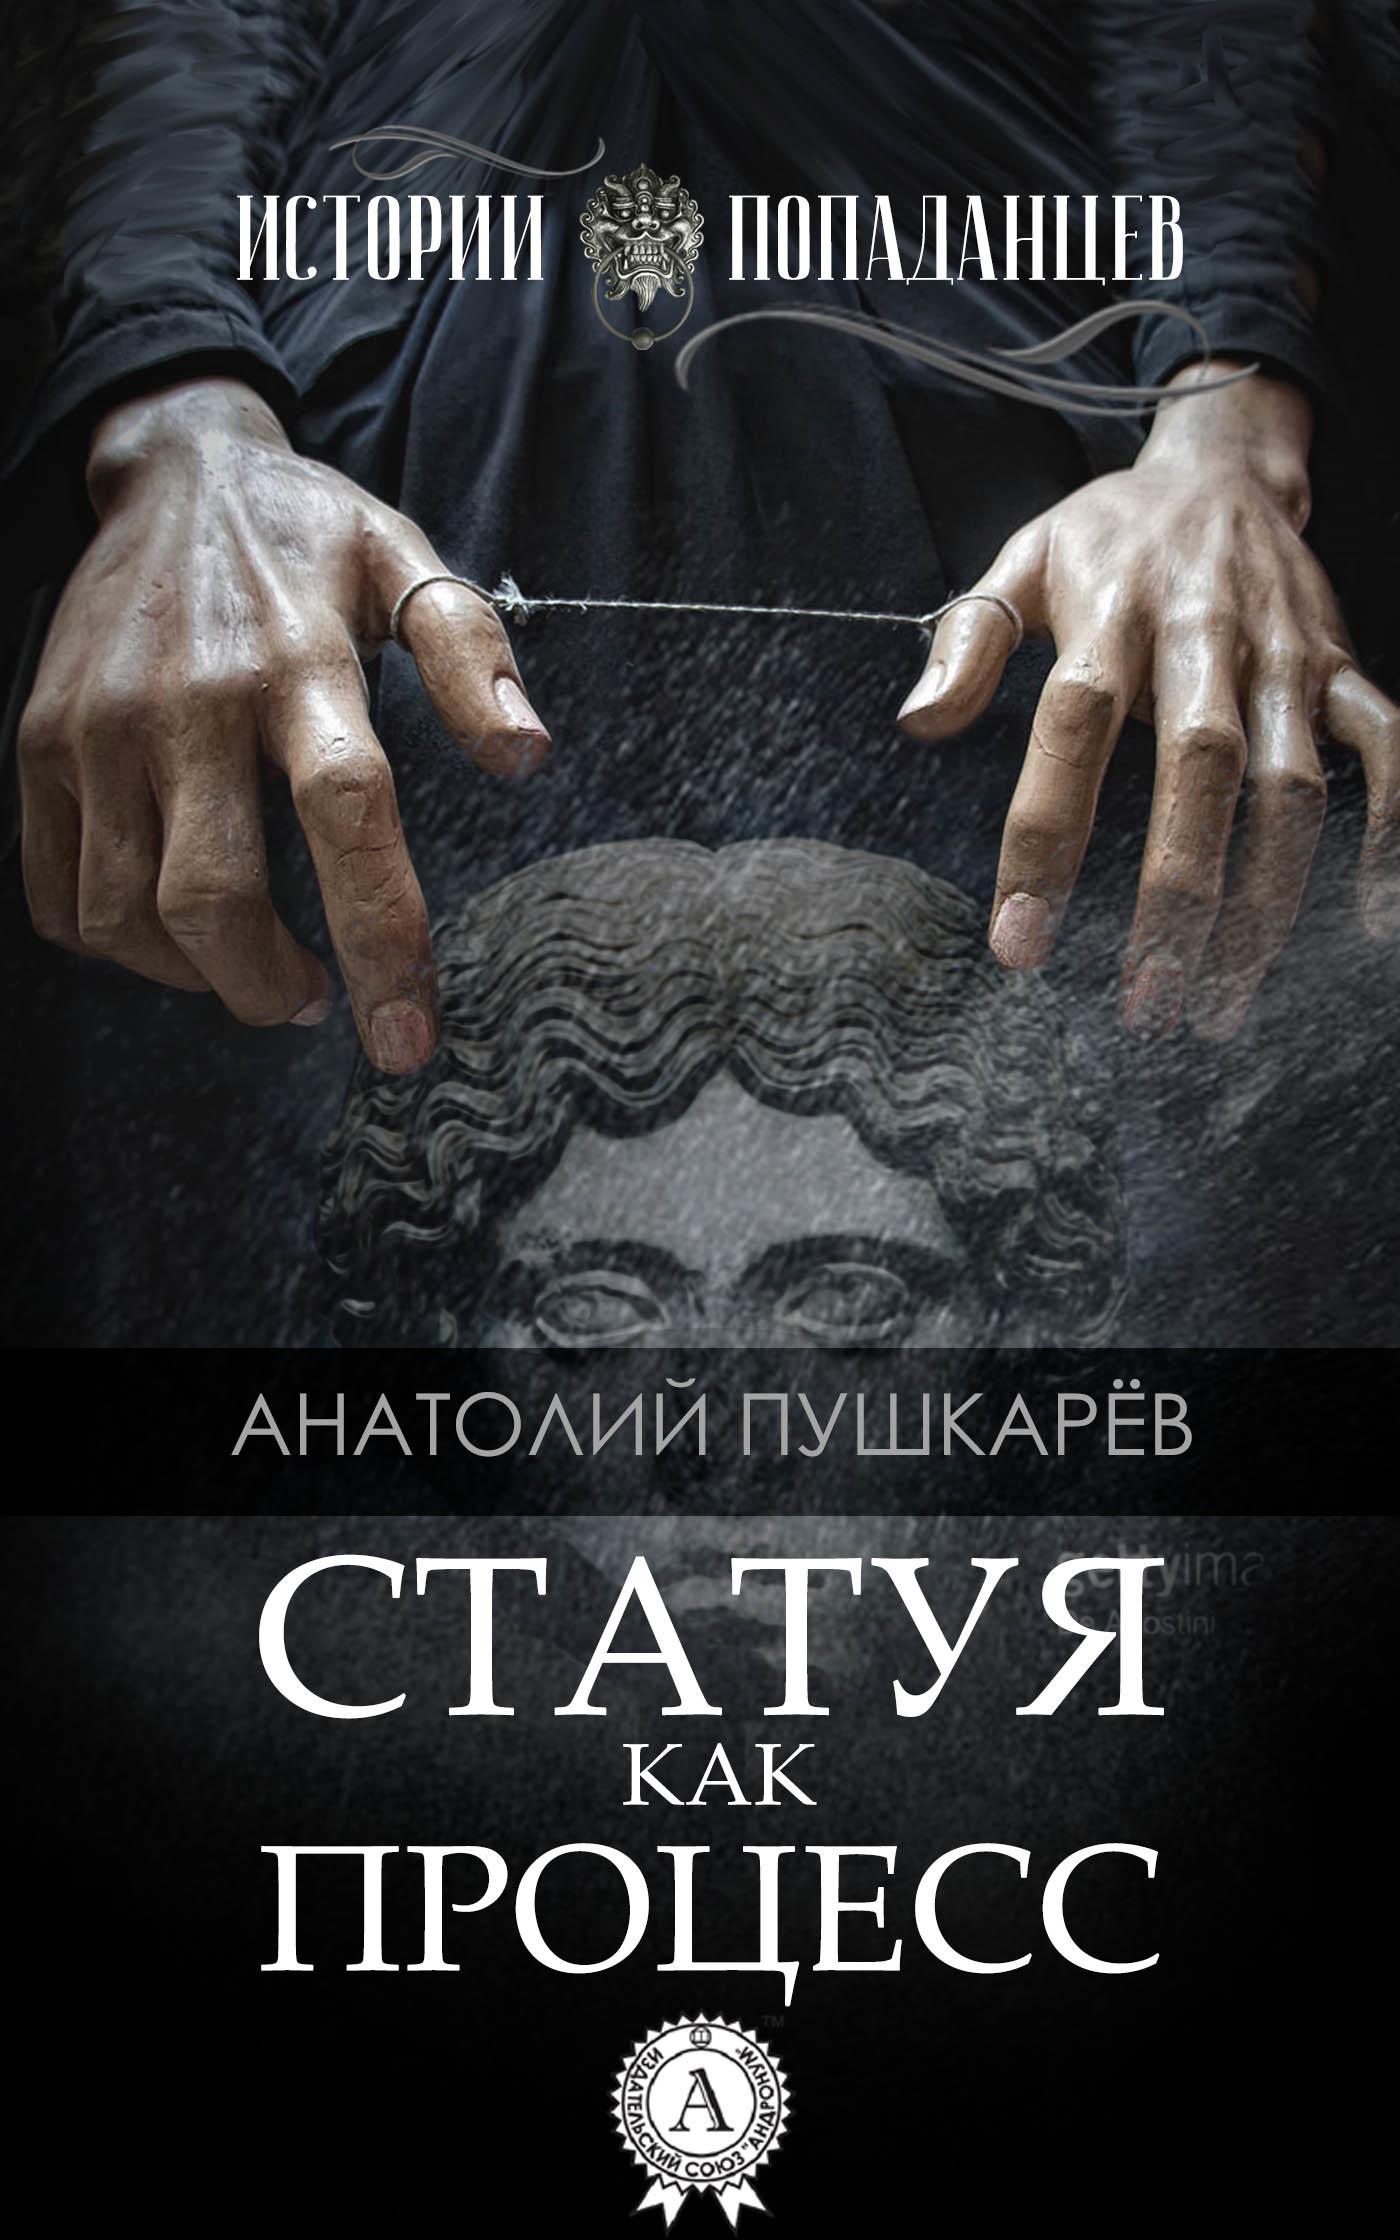 Анатолий Пушкарёв бесплатно